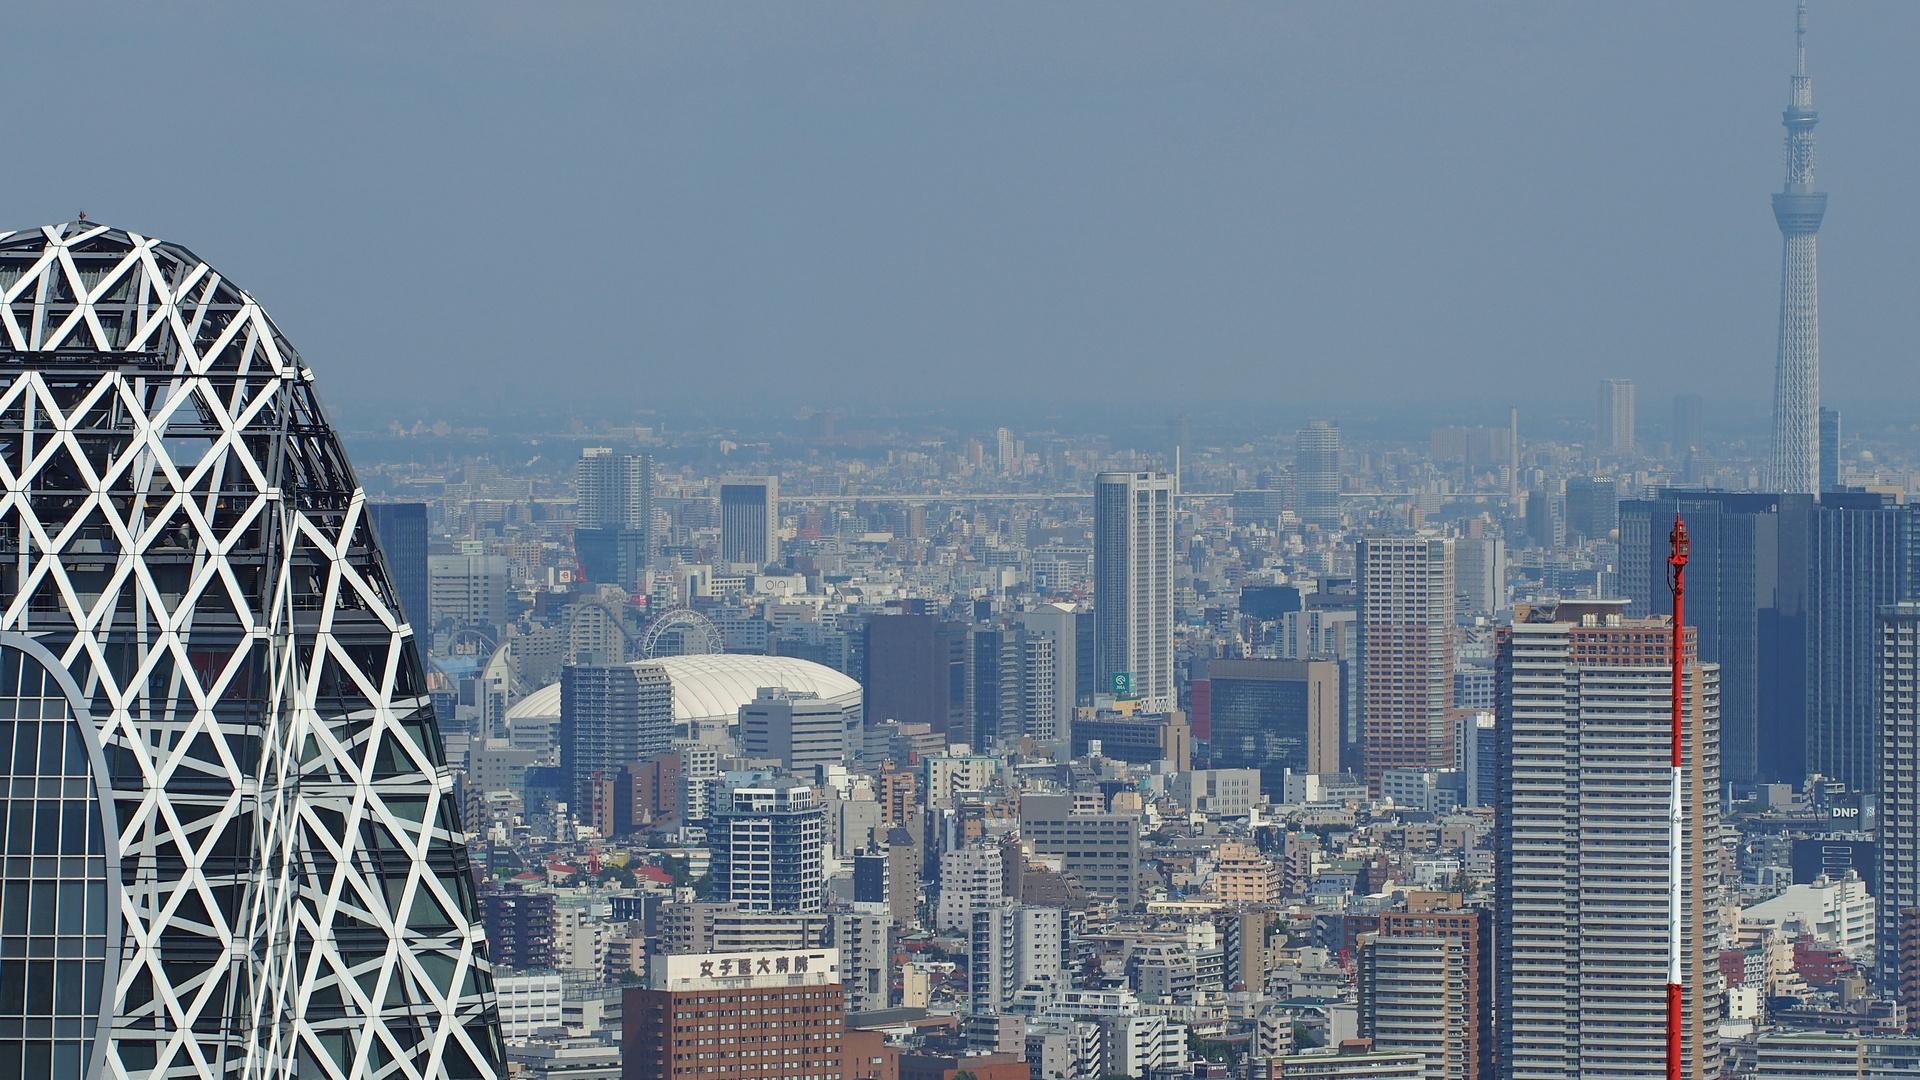 Metropolitan Tower 9